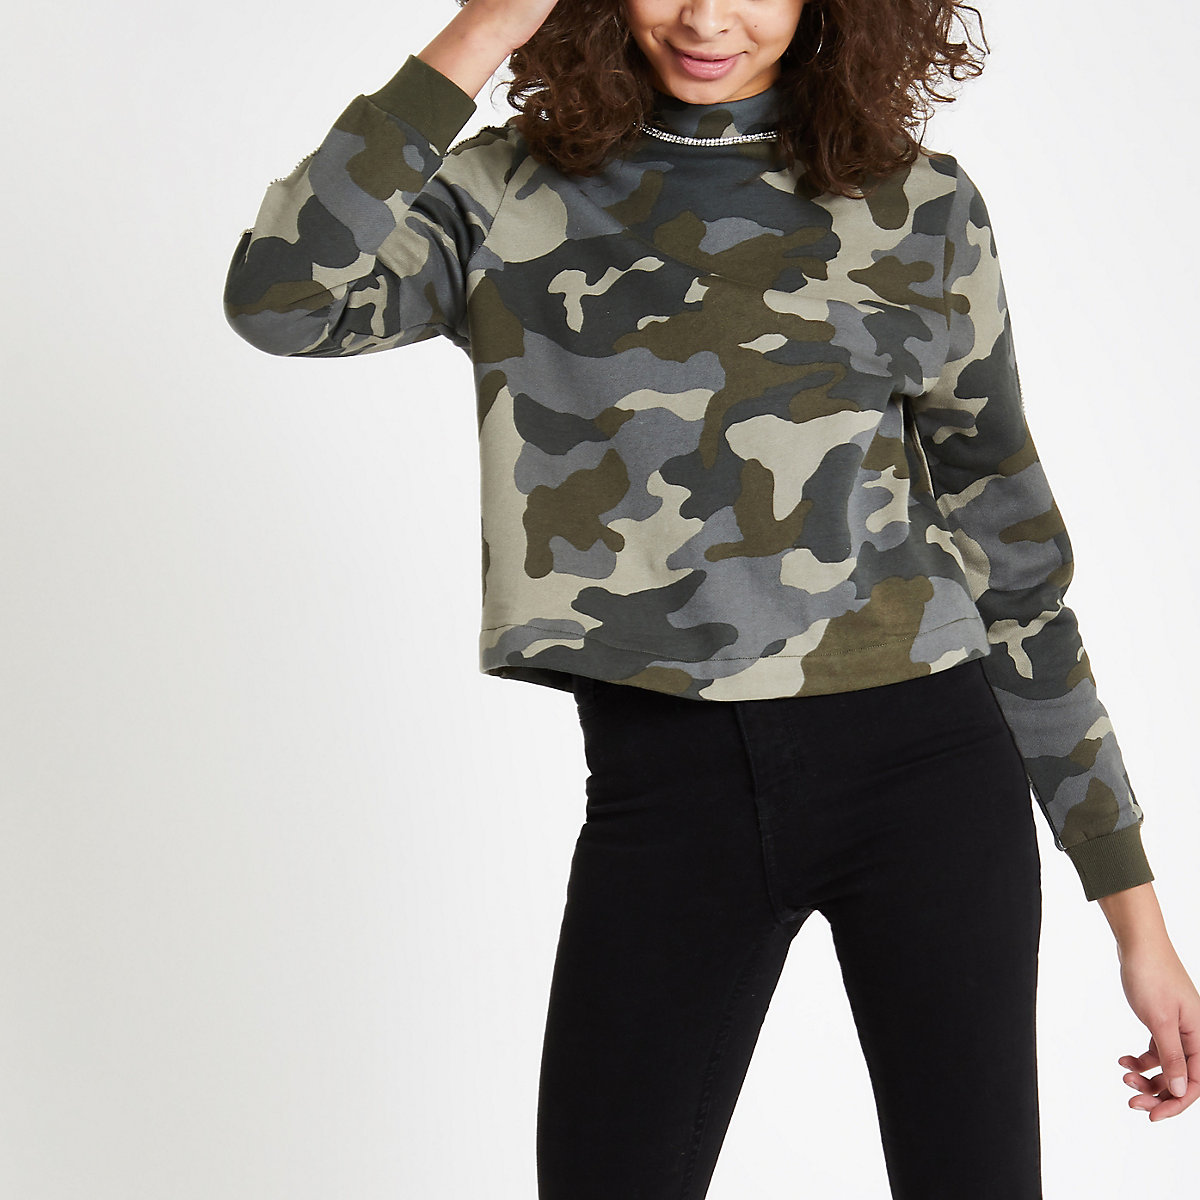 Khaki camo print rhinestone trim sweatshirt